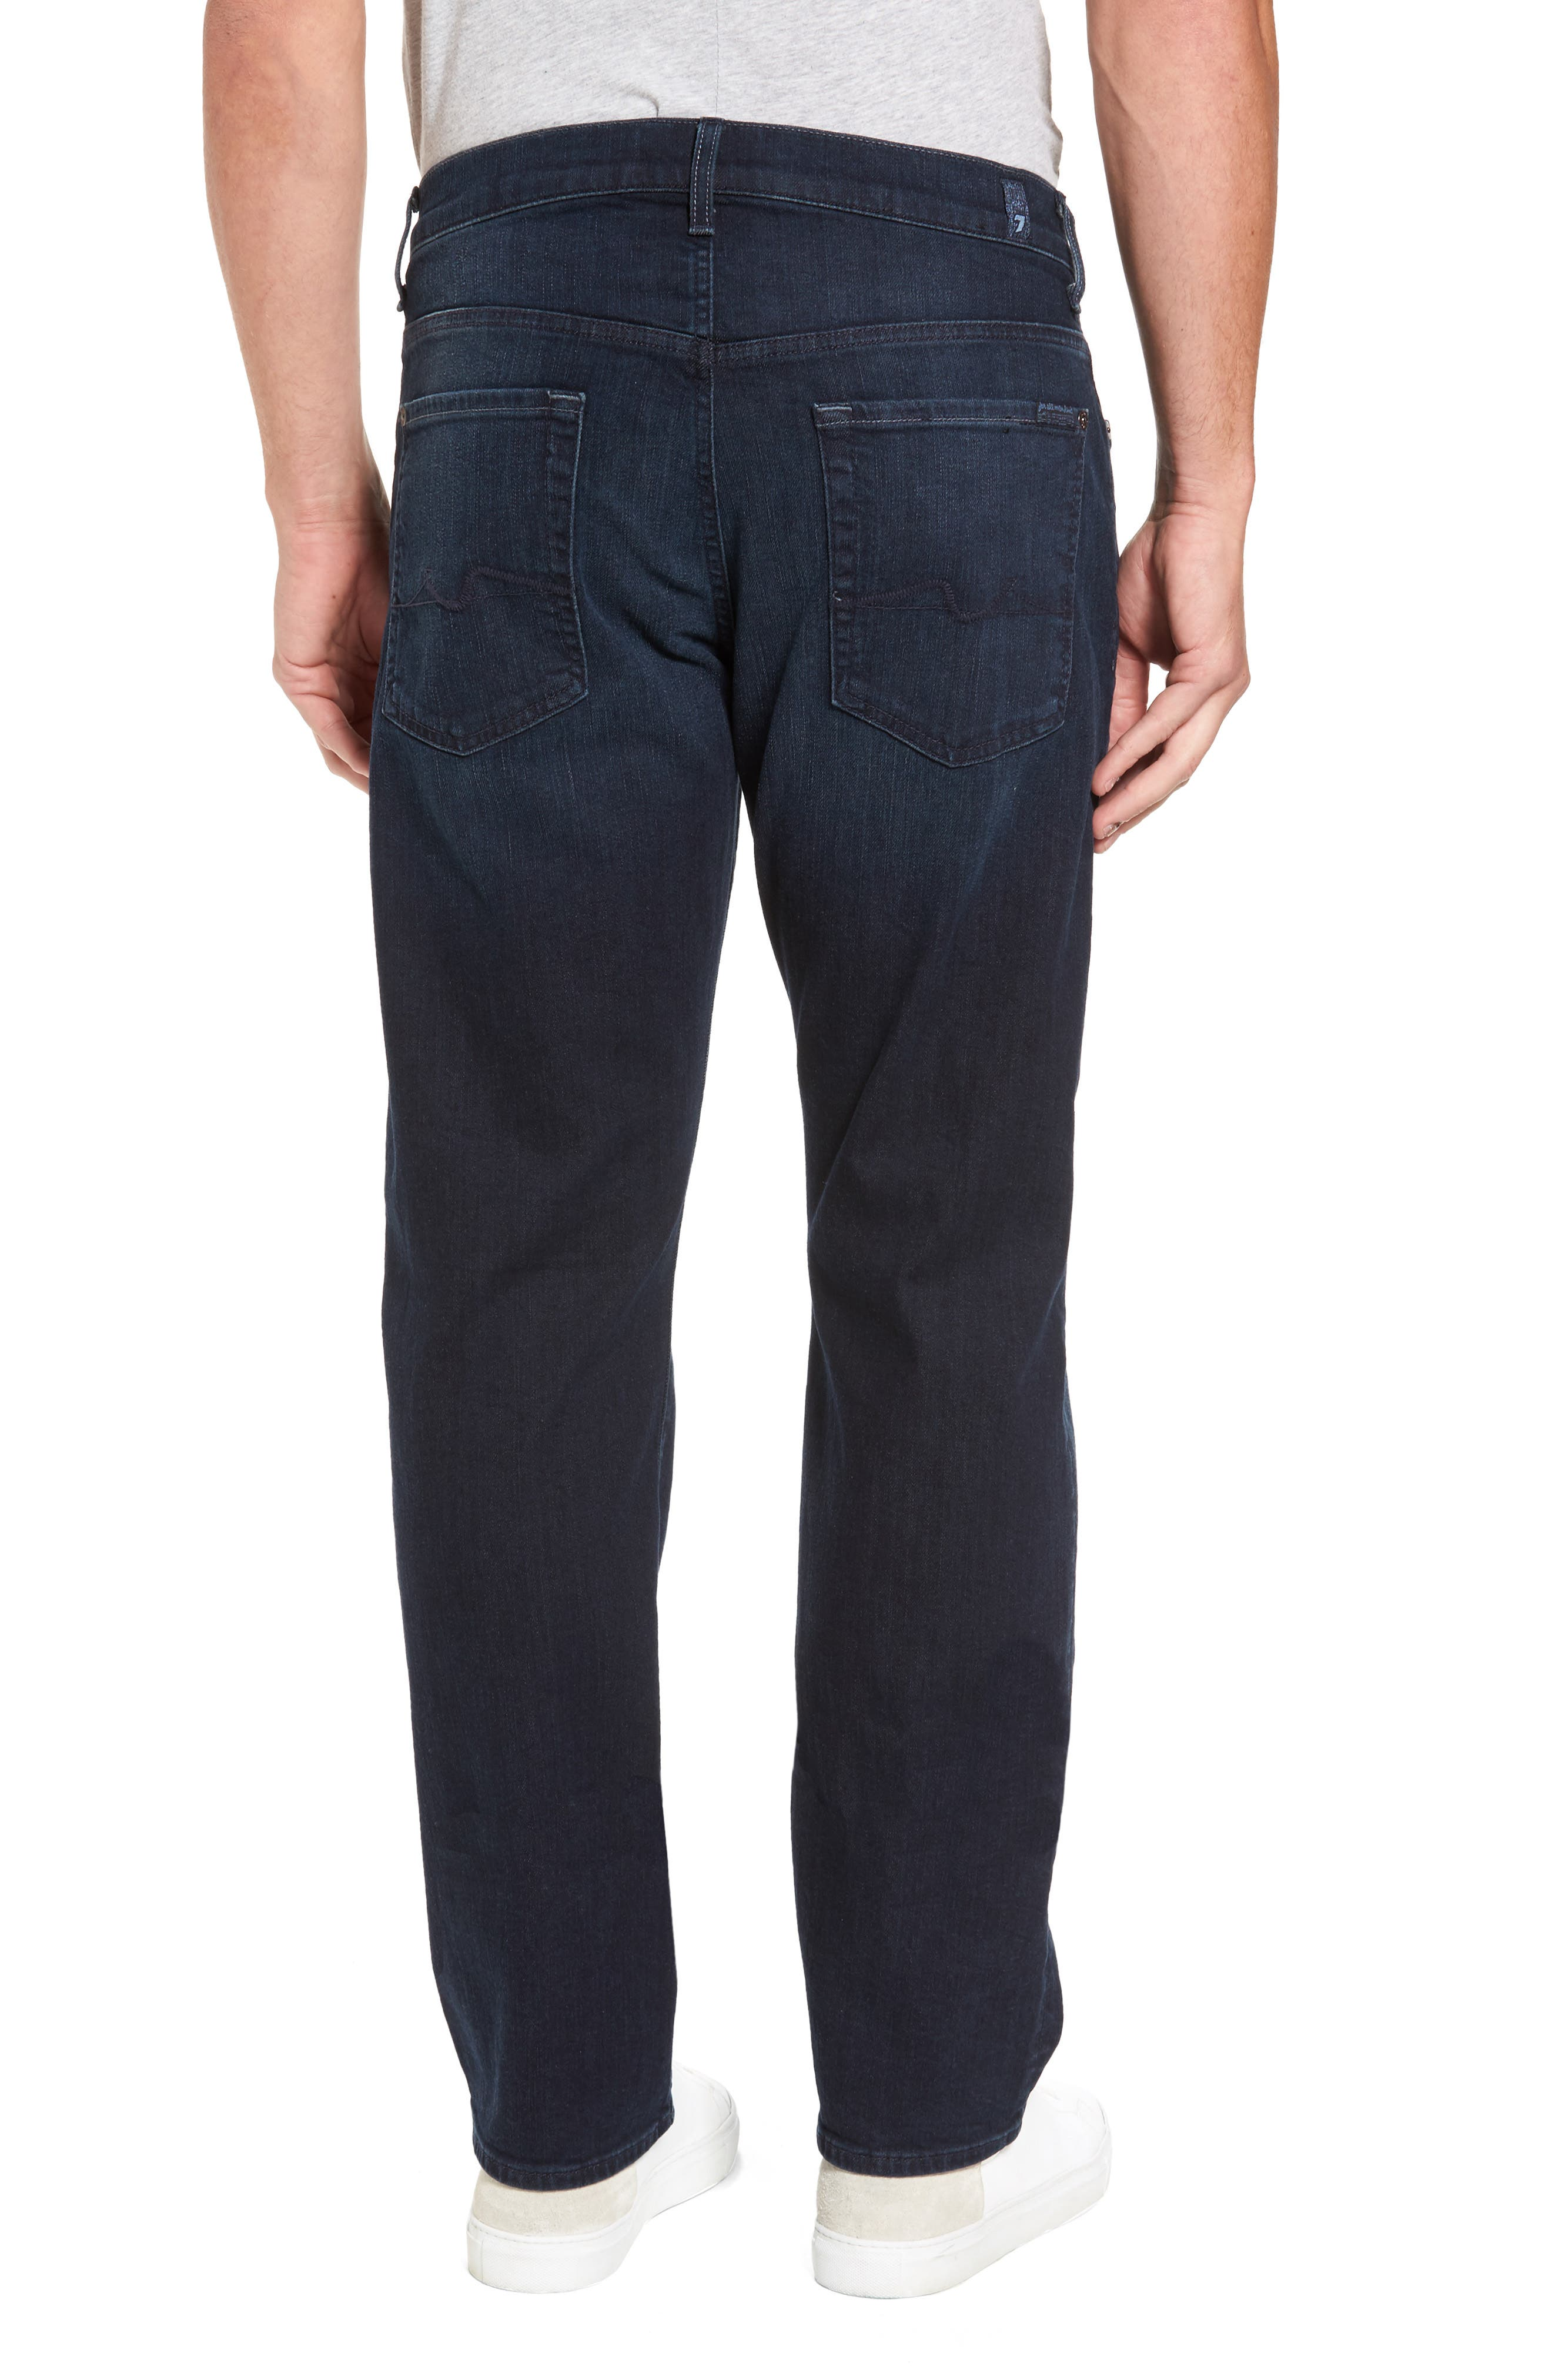 Luxe Performance - Carsen Straight Leg Jeans,                             Alternate thumbnail 2, color,                             Dark Current